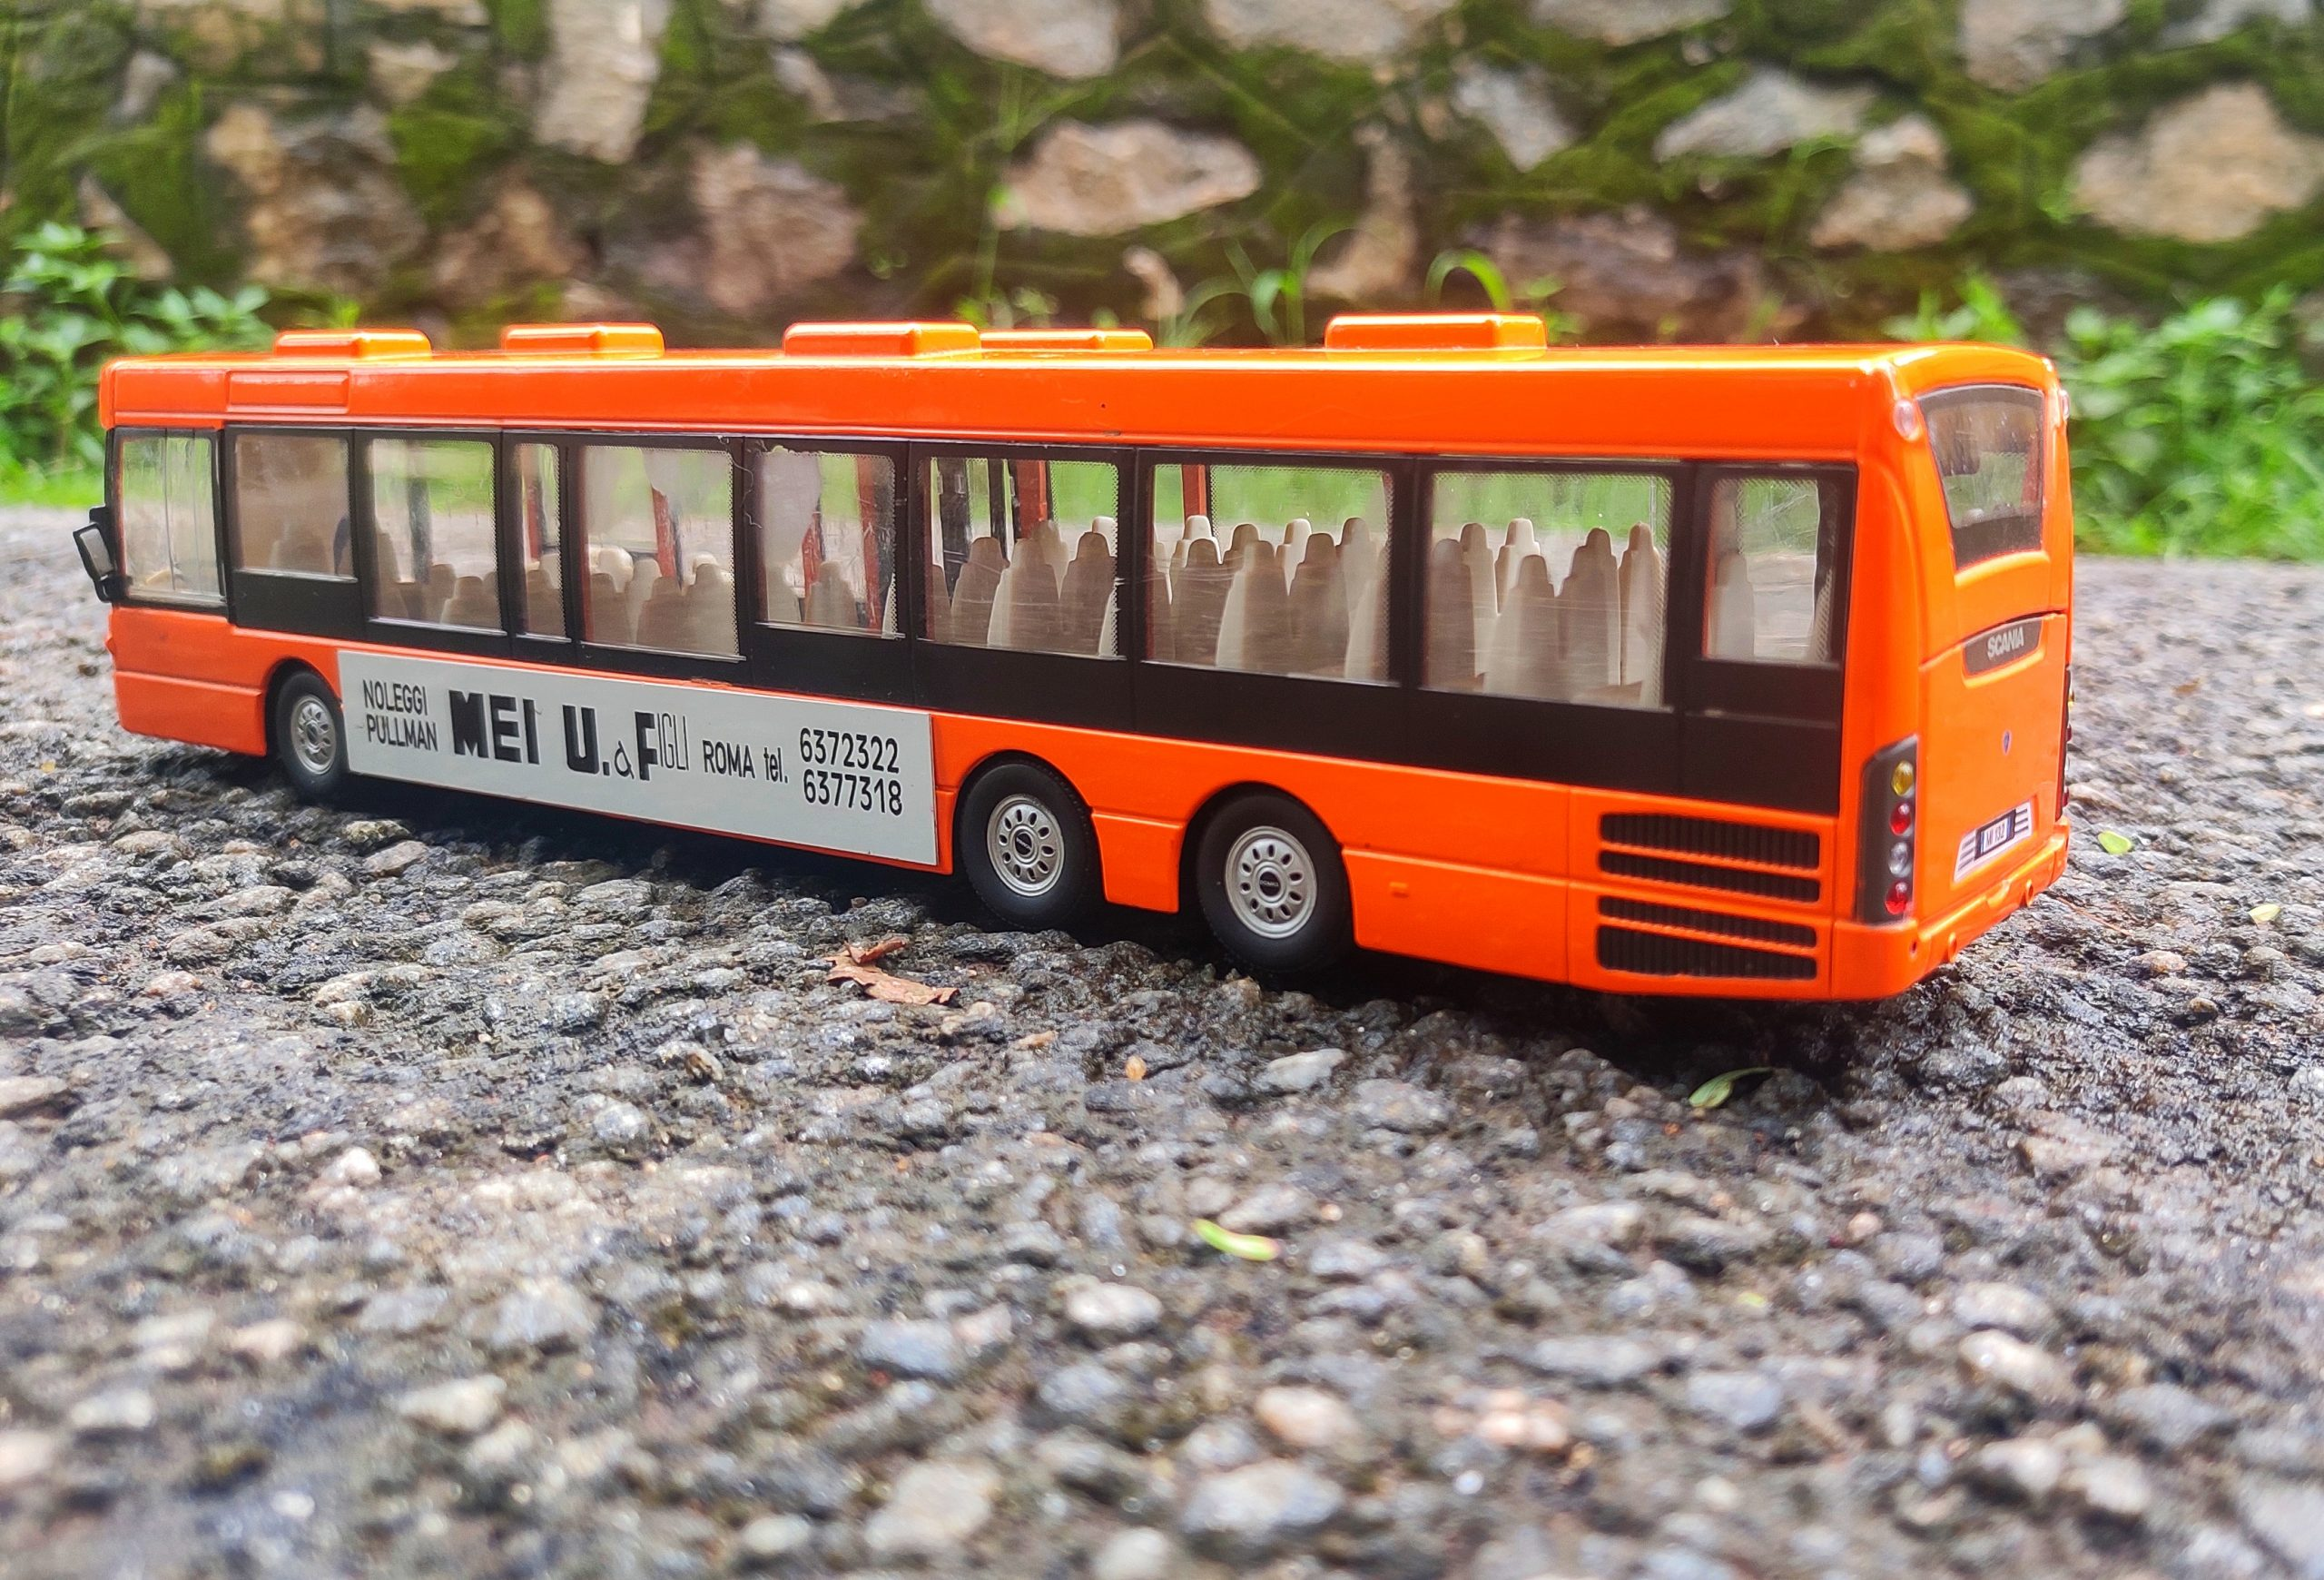 A miniature bus model